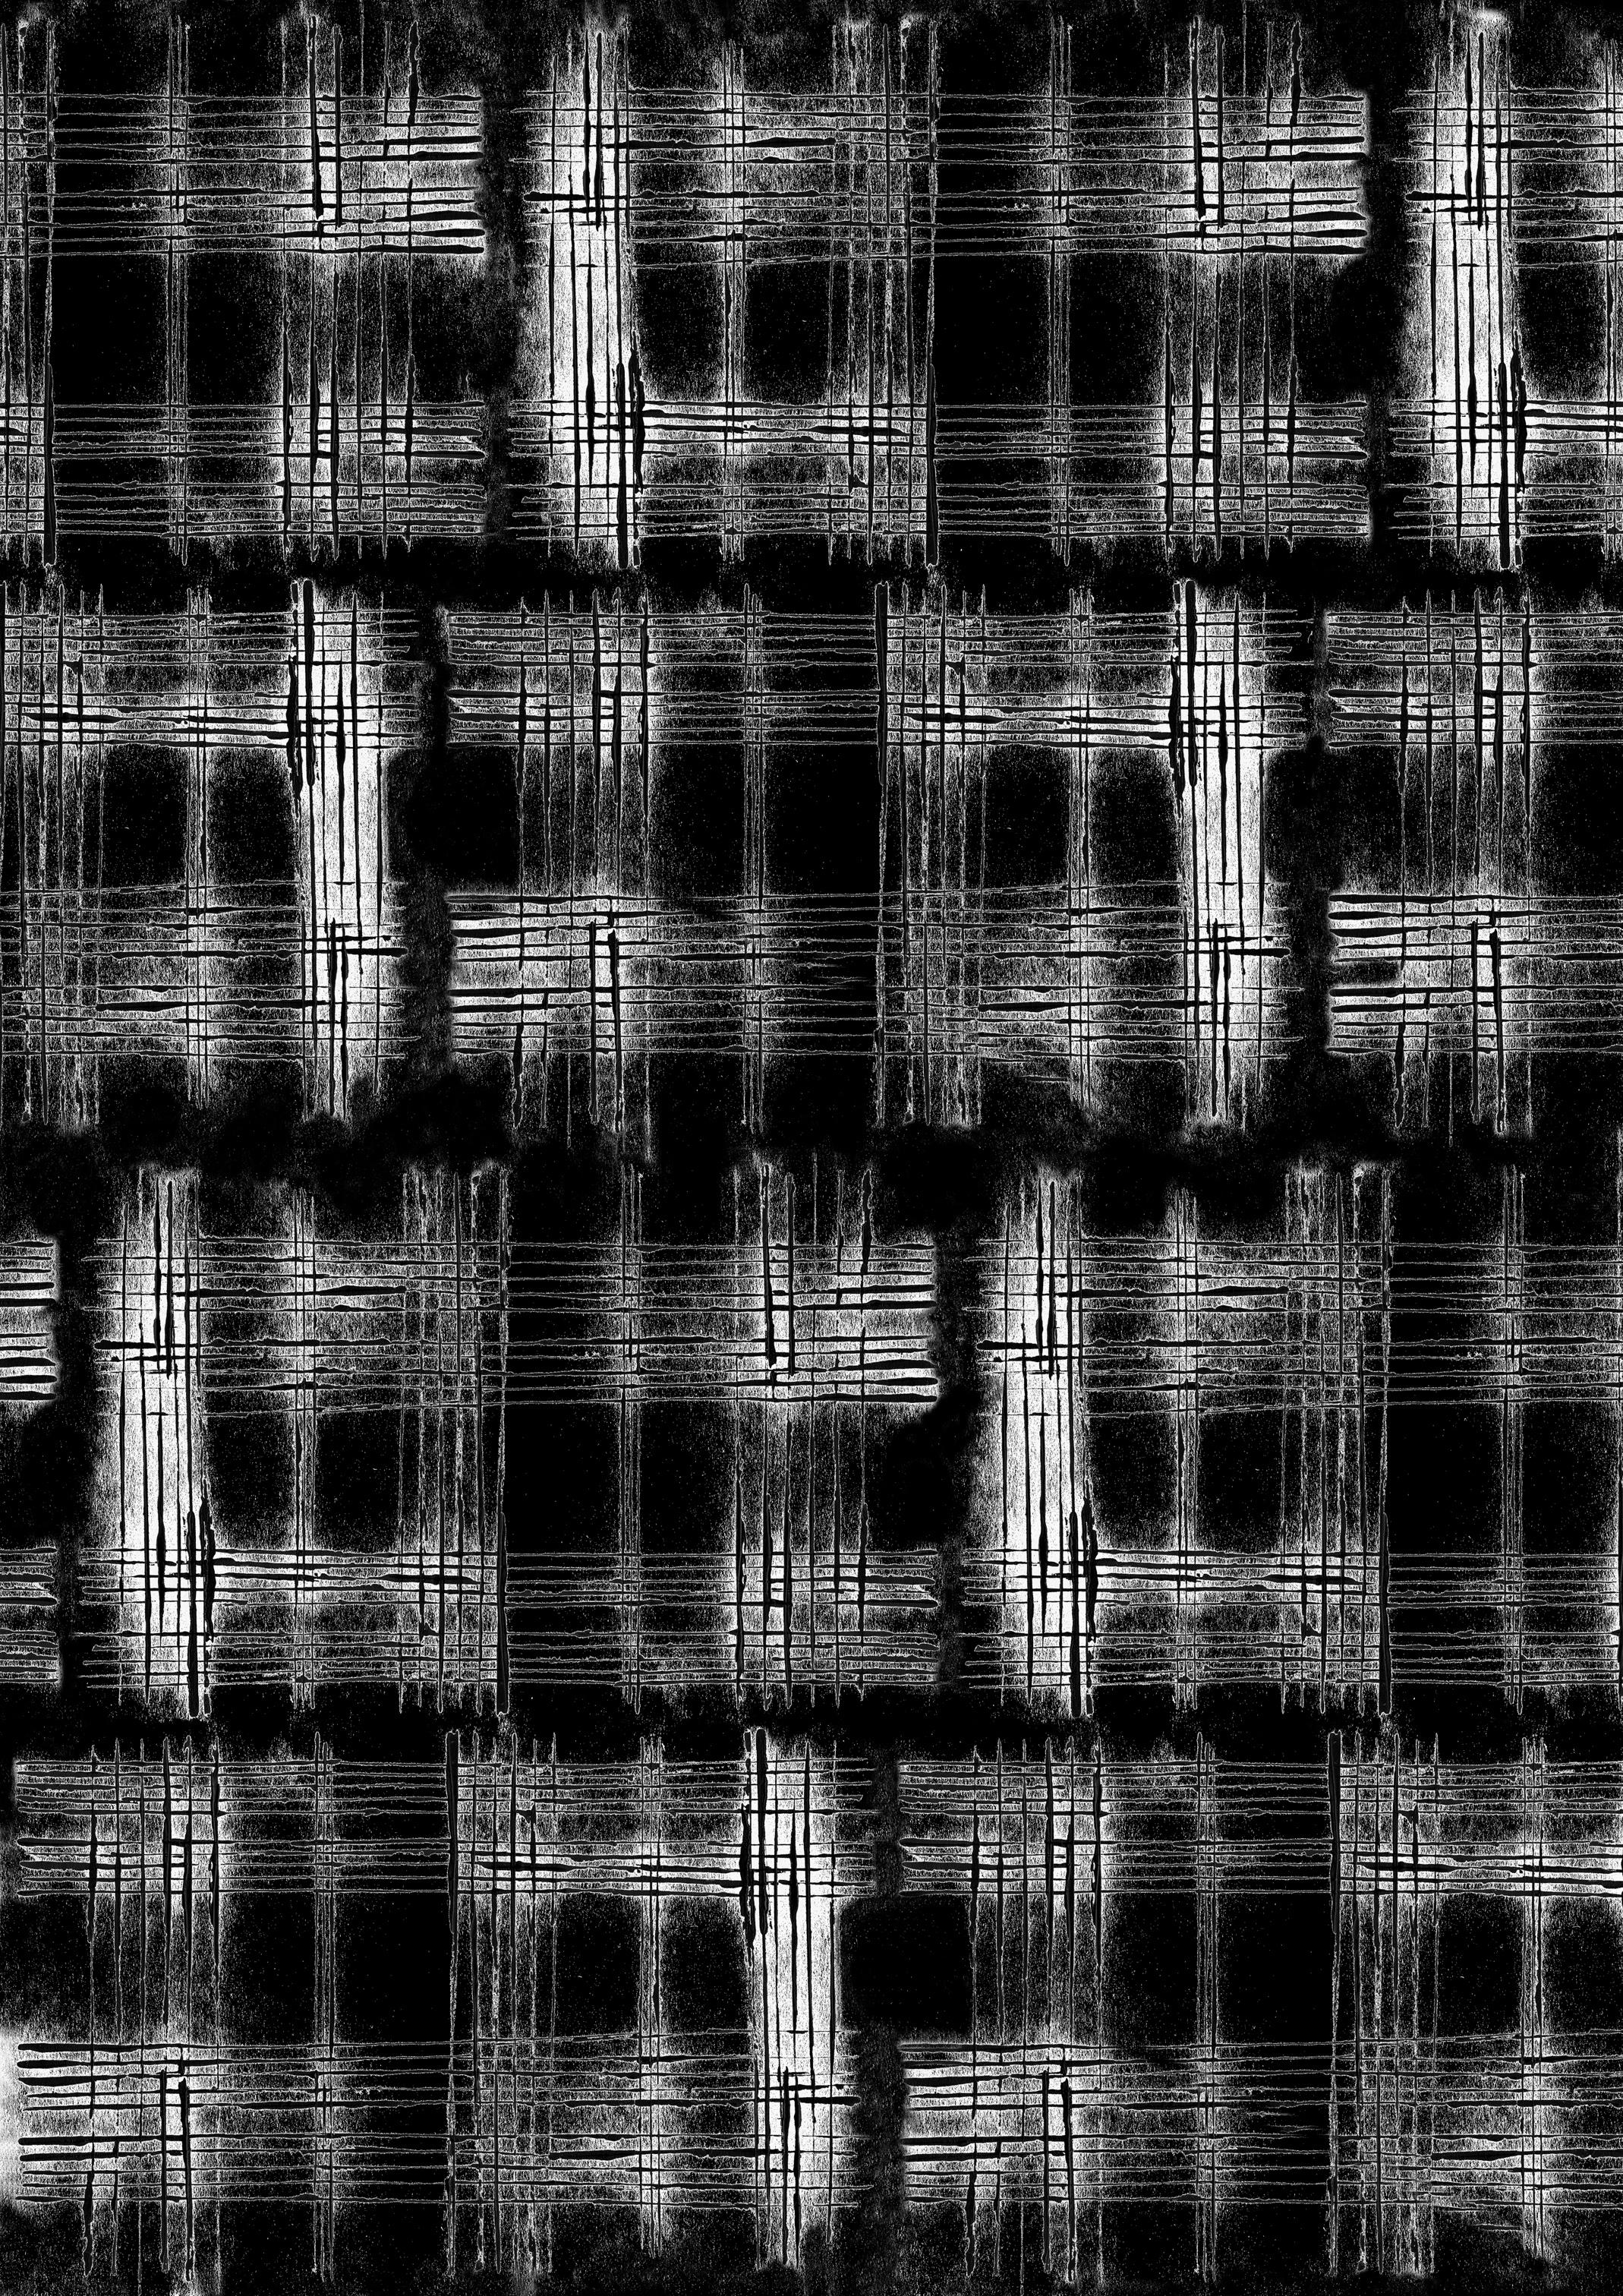 002_print_2014.jpg